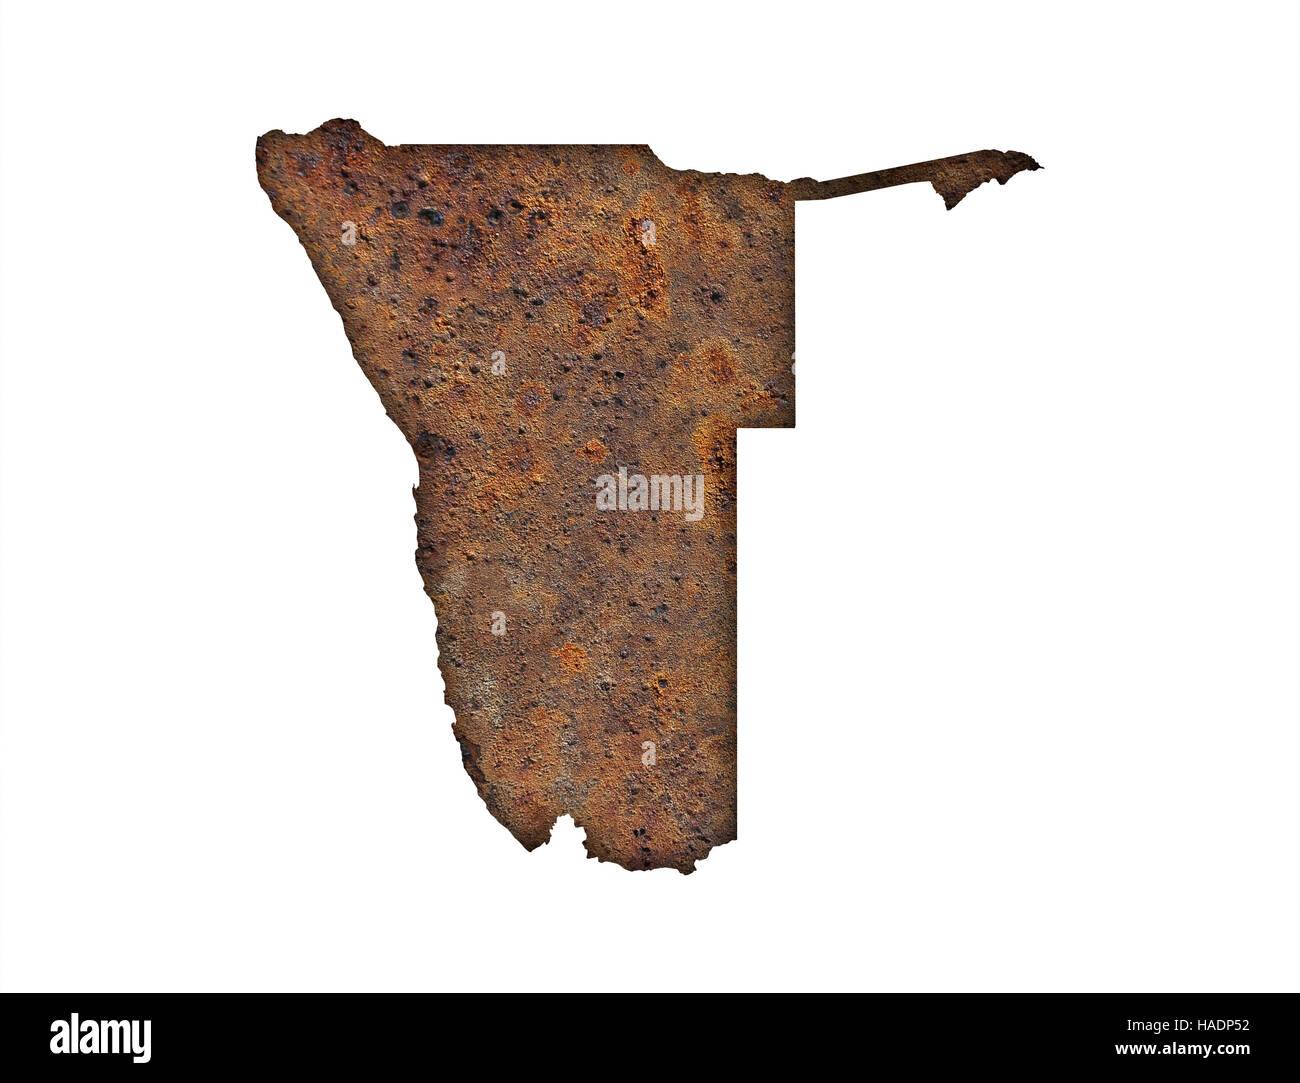 Map of Namibia on rusty metal - Stock Image